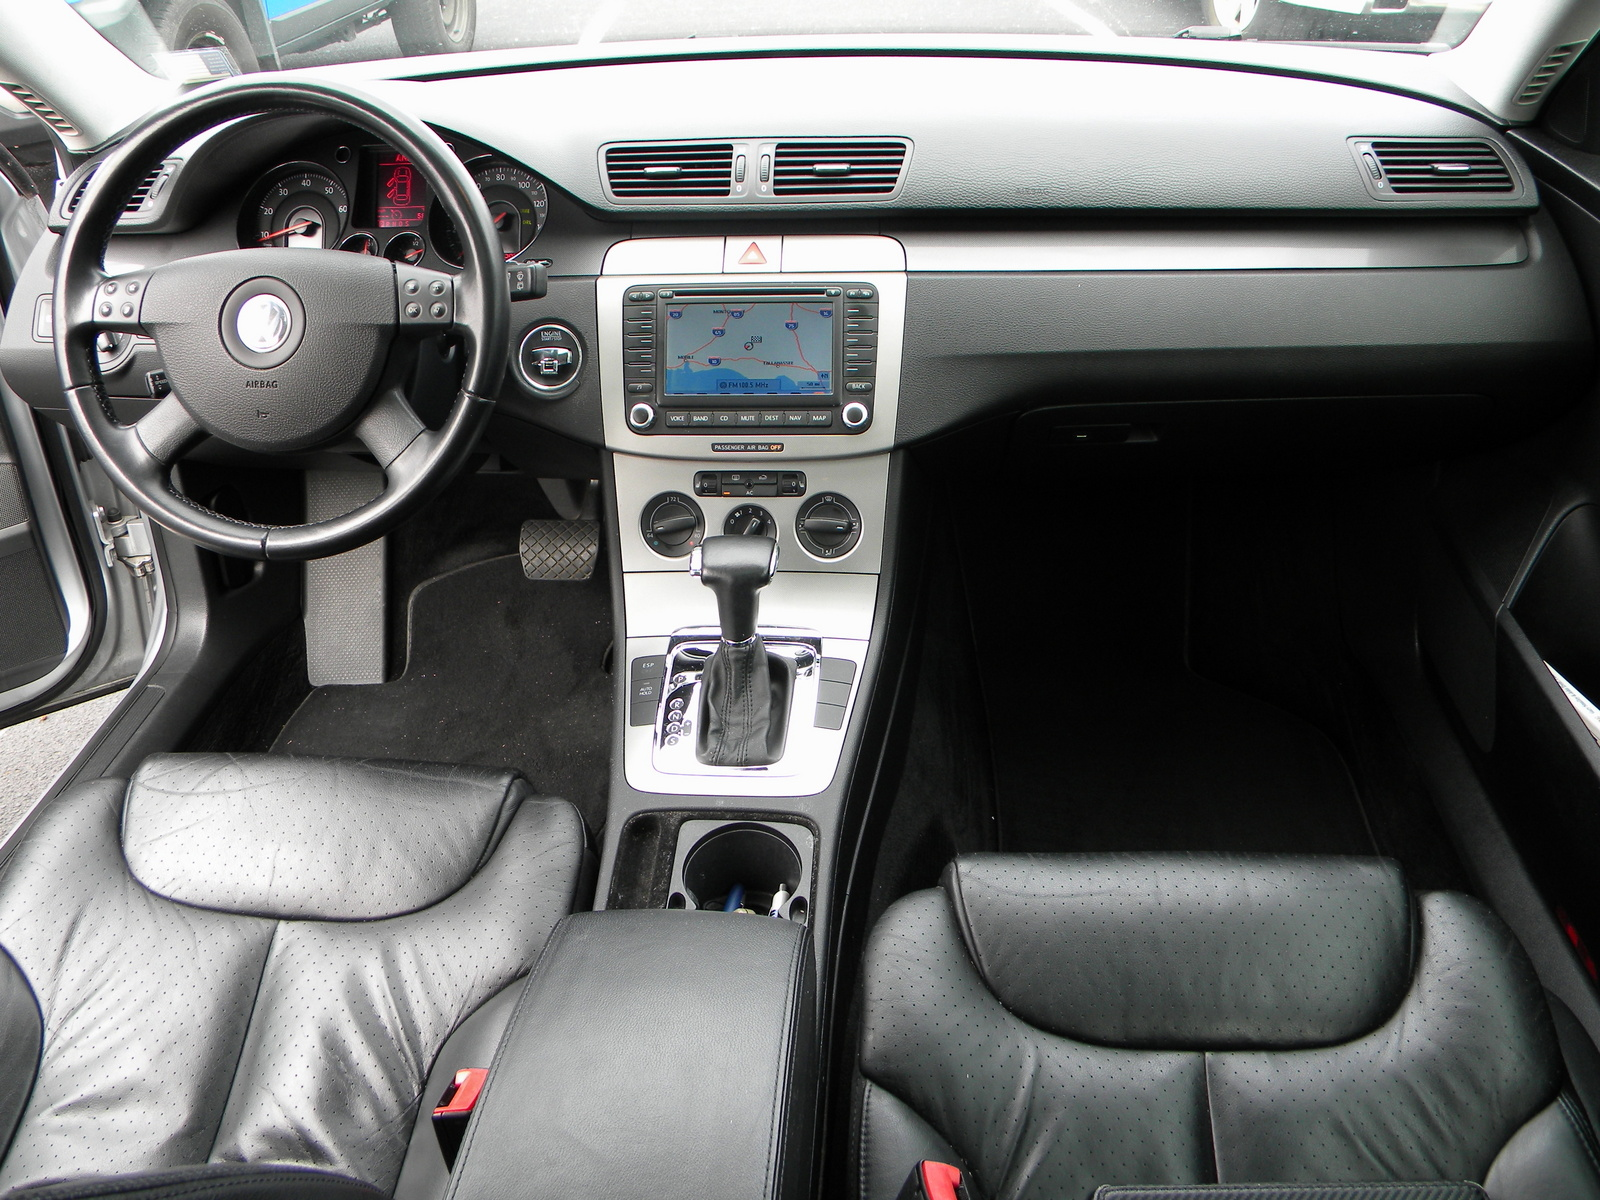 passat 2007 volkswagen interior wagon 0t cargurus